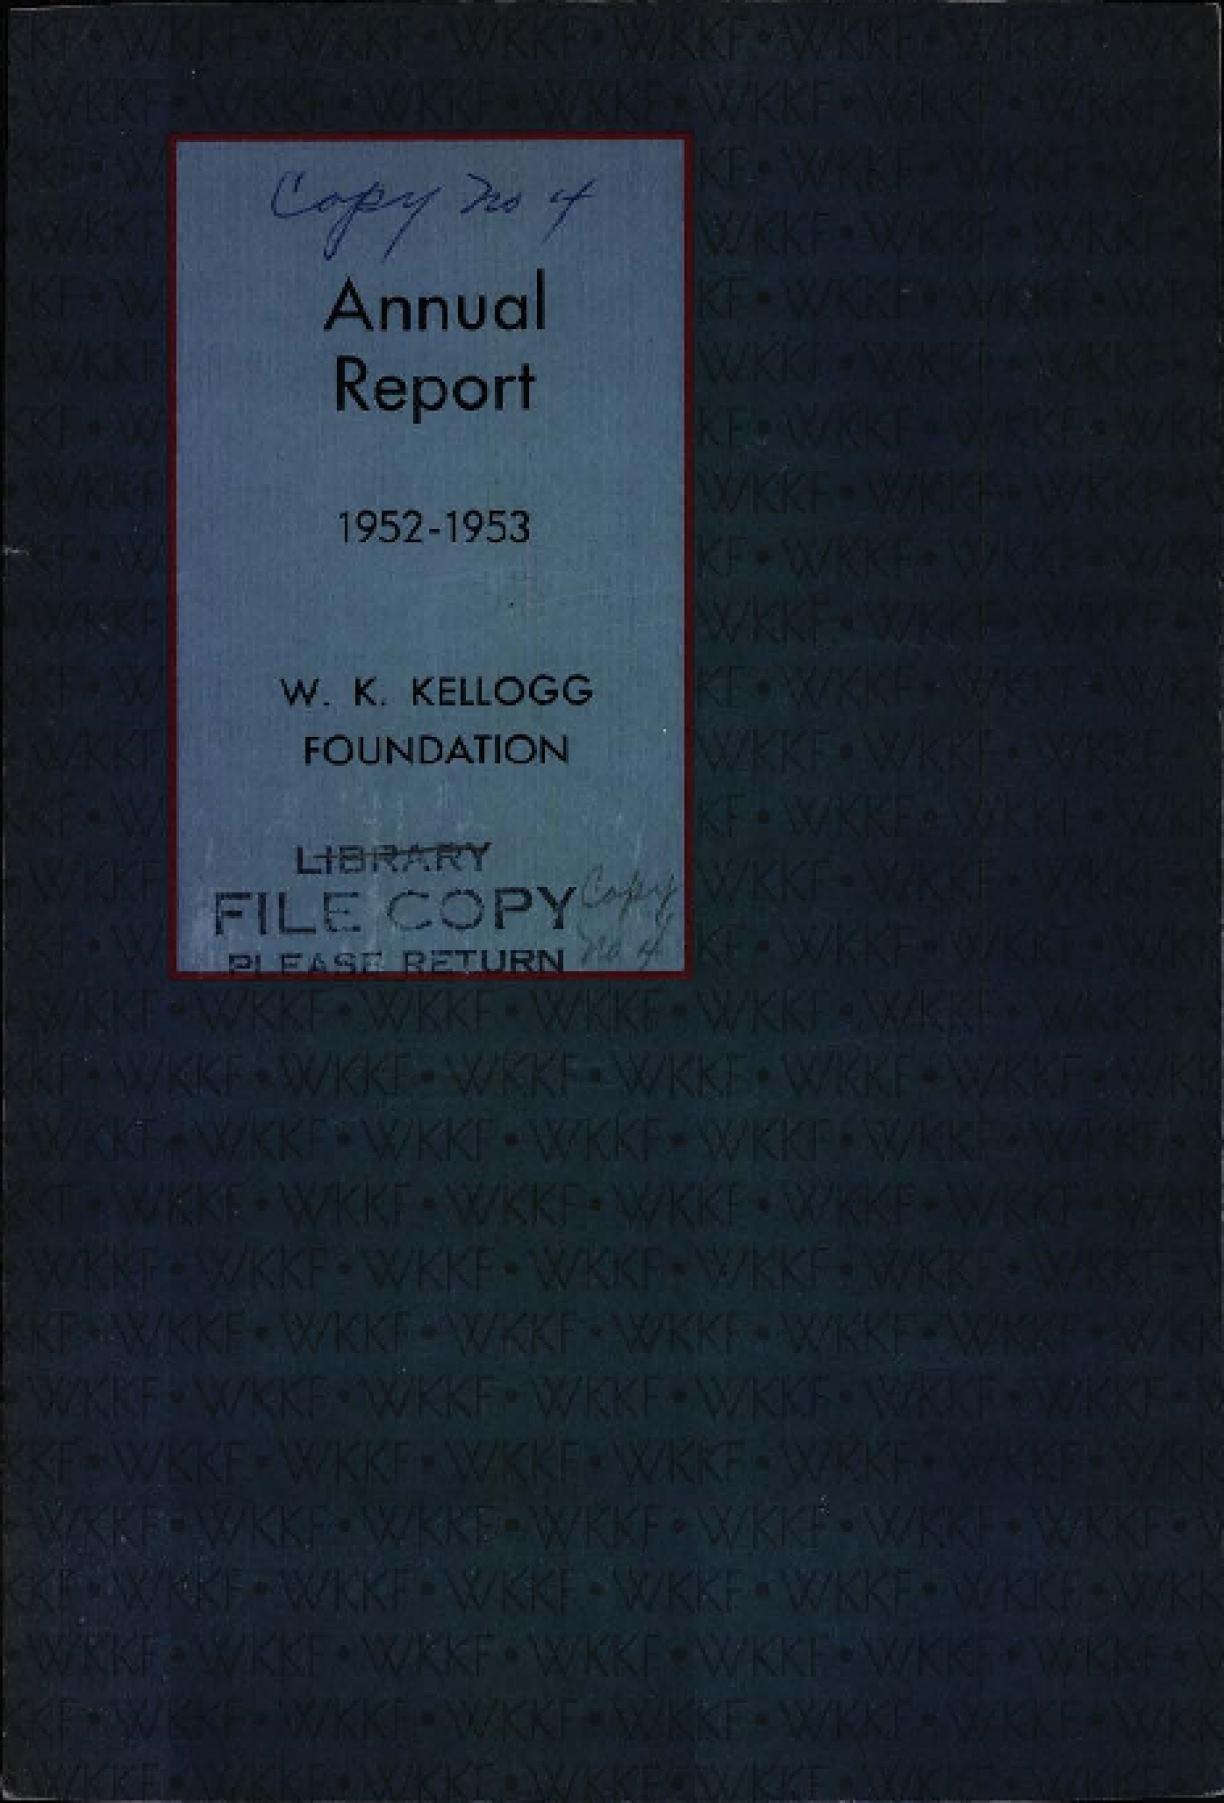 1952-1953 W.K. Kellogg Foundation Annual Report